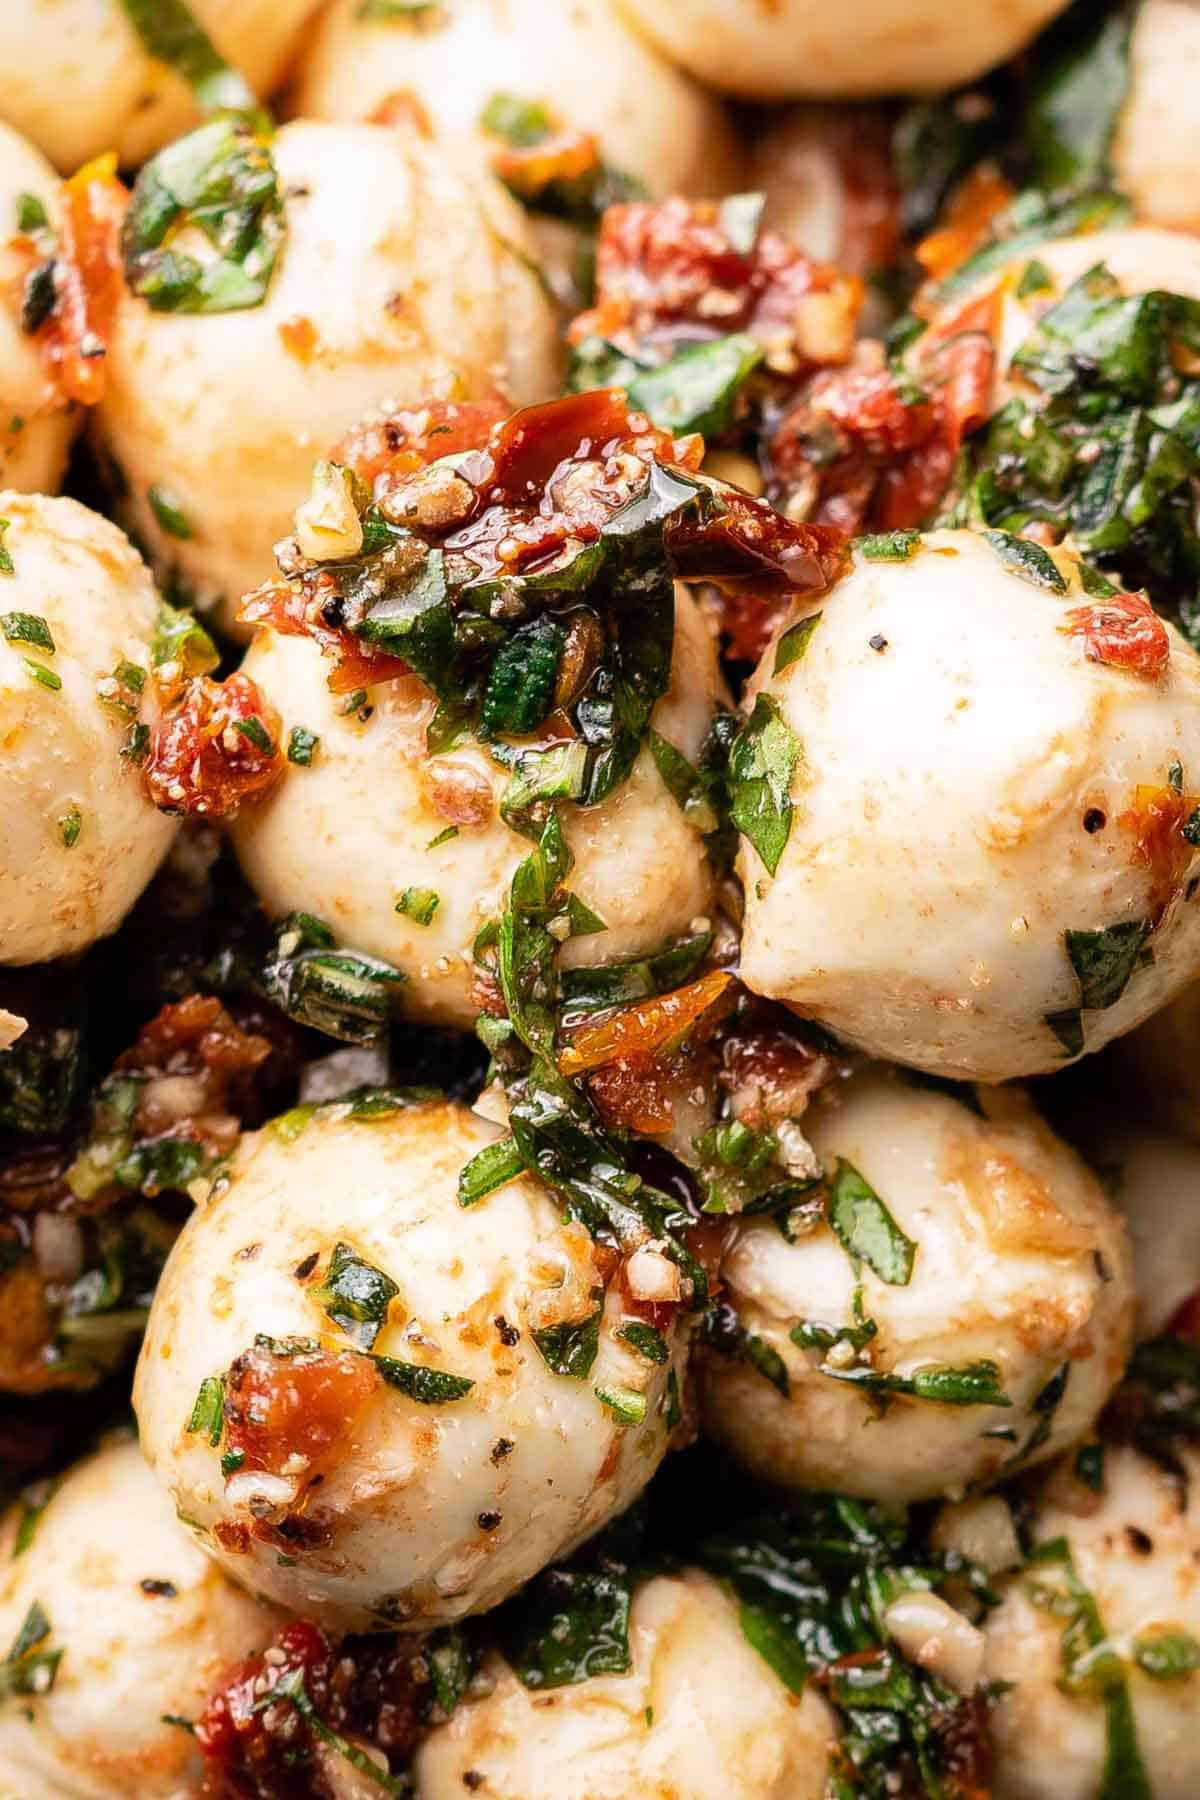 close up view of marinated mozzarella balls